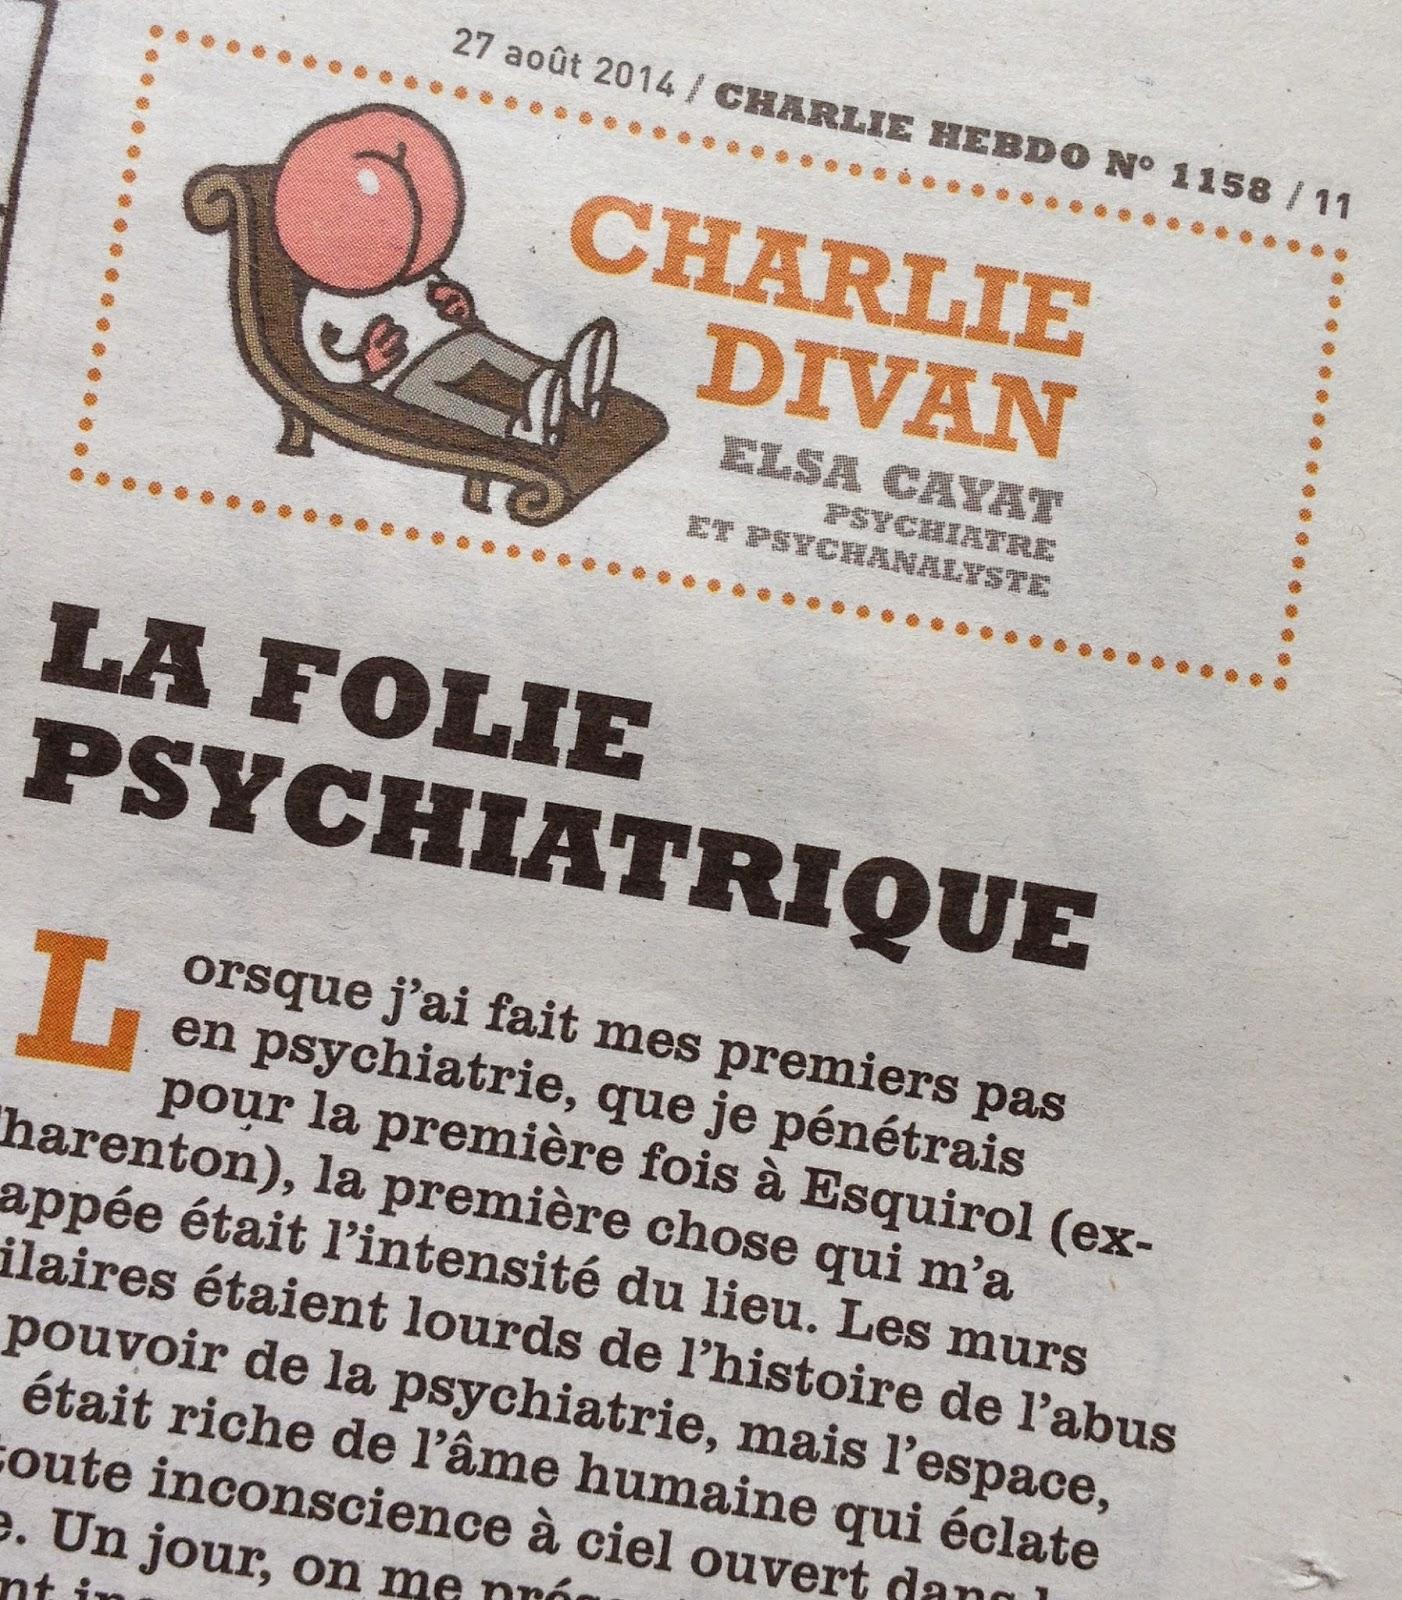 Emmanuel Chaussade: Elsa Cayat - Charlie Hebdo